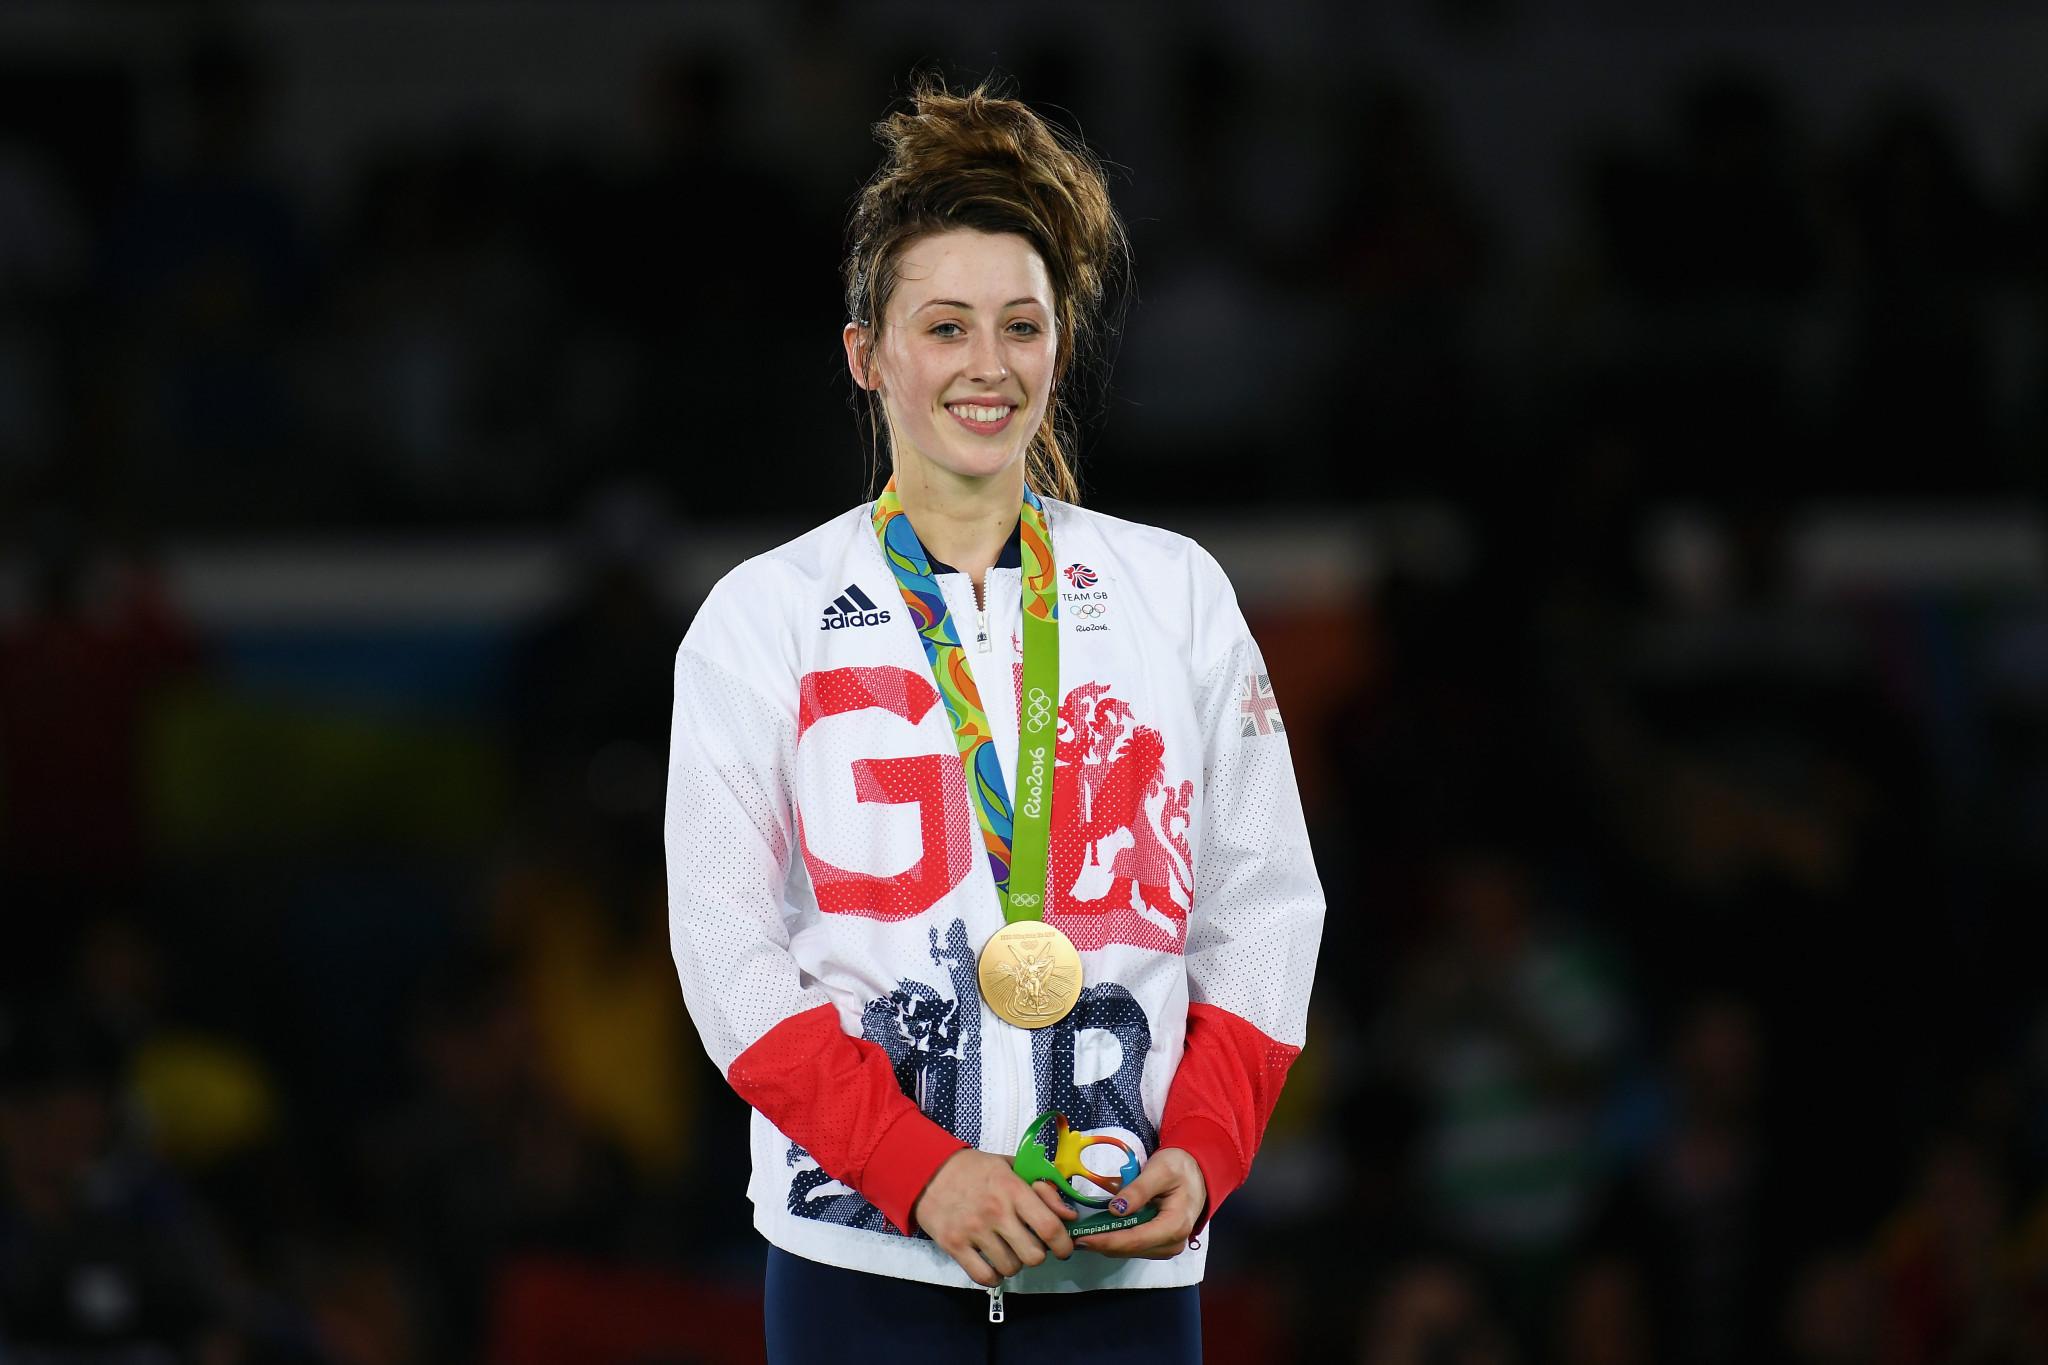 Britain won three taekwondo medals at the Rio 2016 Olympics, including Jade Jones' gold  ©Getty Images